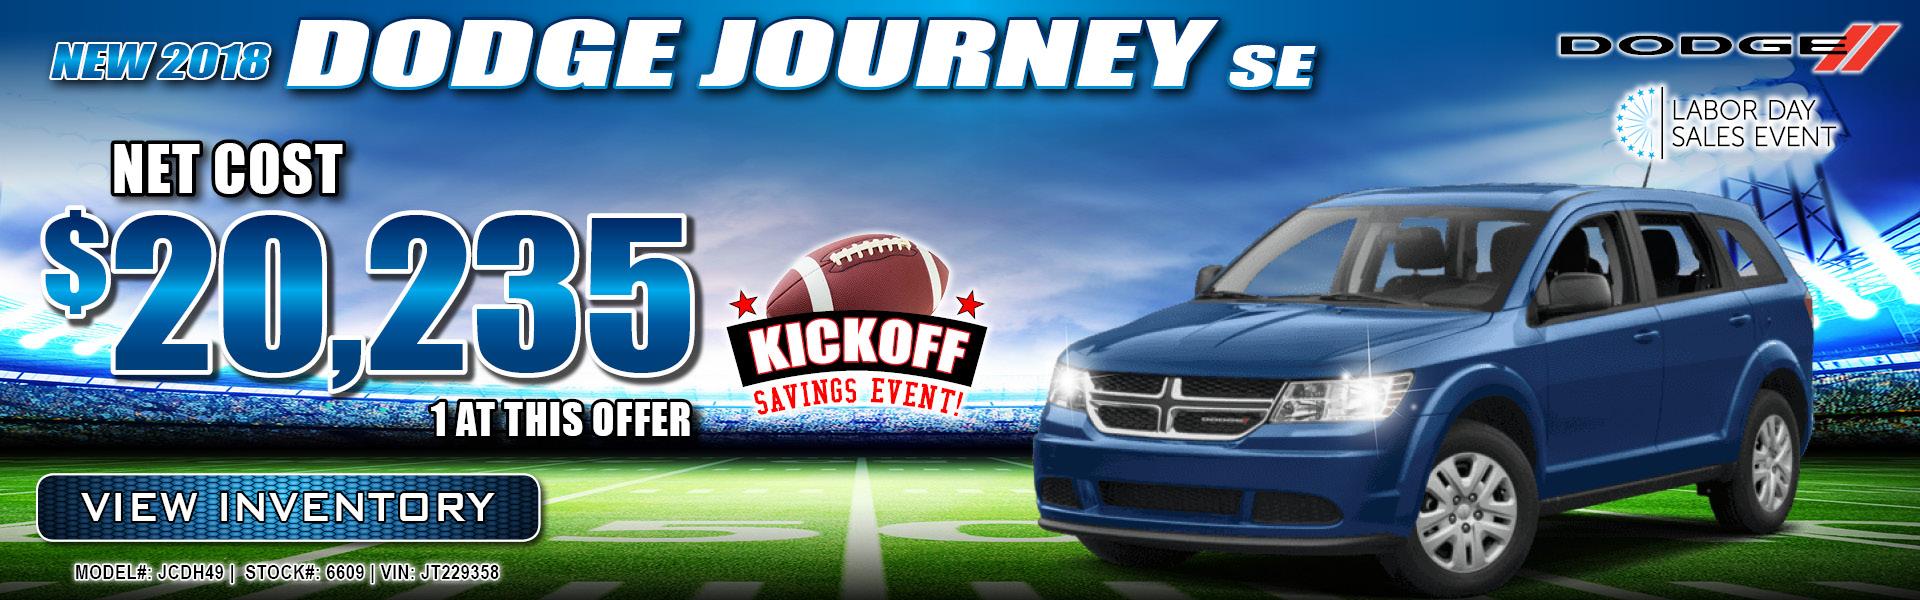 Dodge Journey $20,235